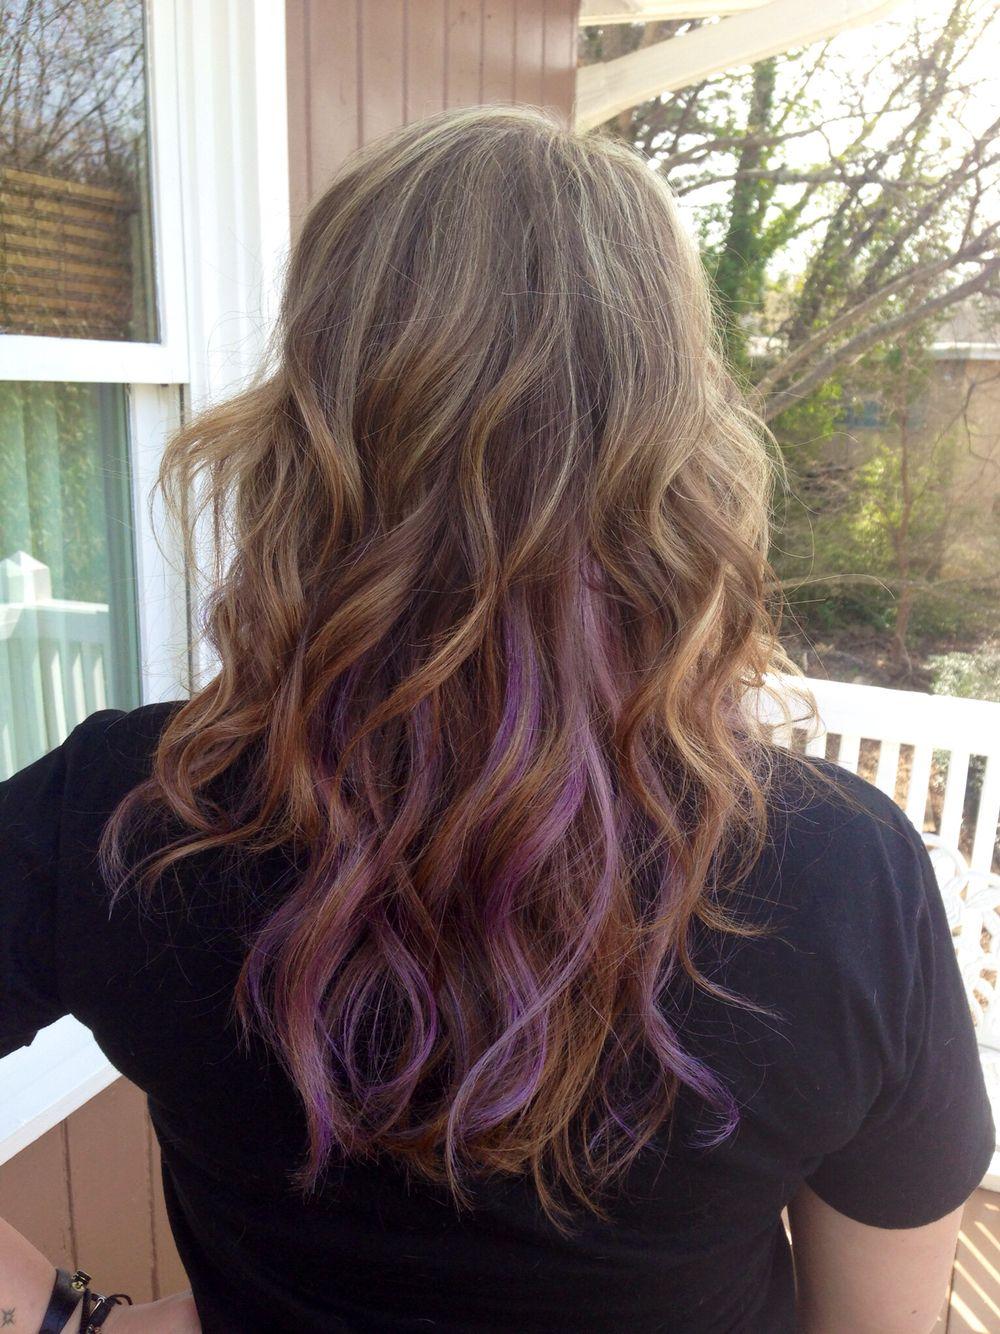 Pastel Purple Highlights On Dark Blonde Curly Hair Purple Hair Streaks Curly Hair Styles Hair Streaks